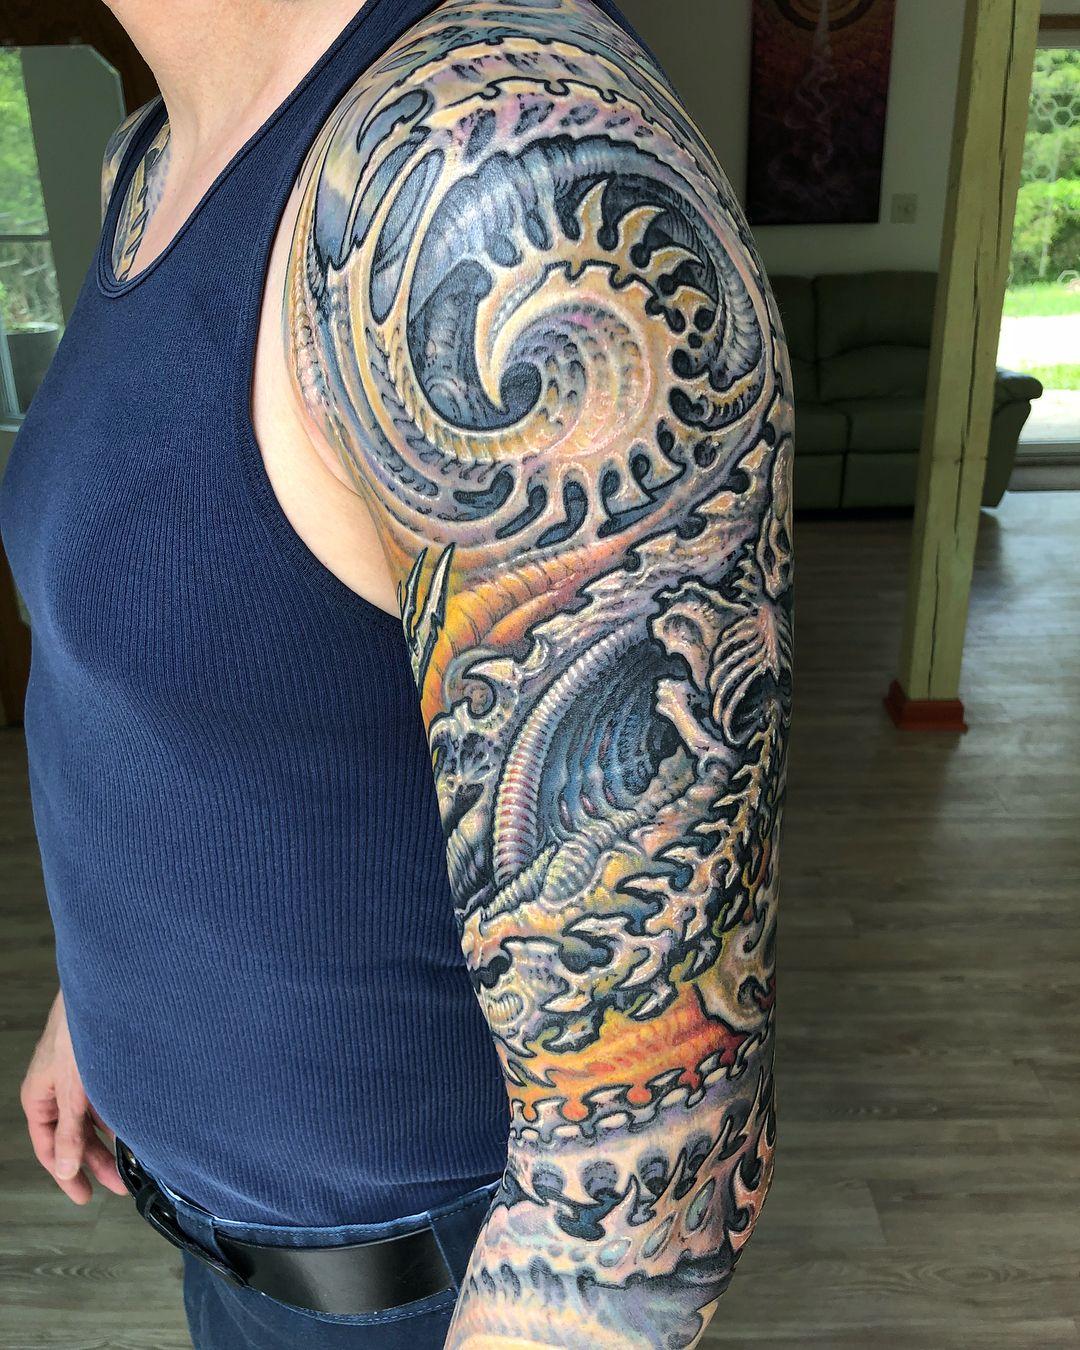 Biomechanical tattoo Guy Aitchison Half sleeve tattoos